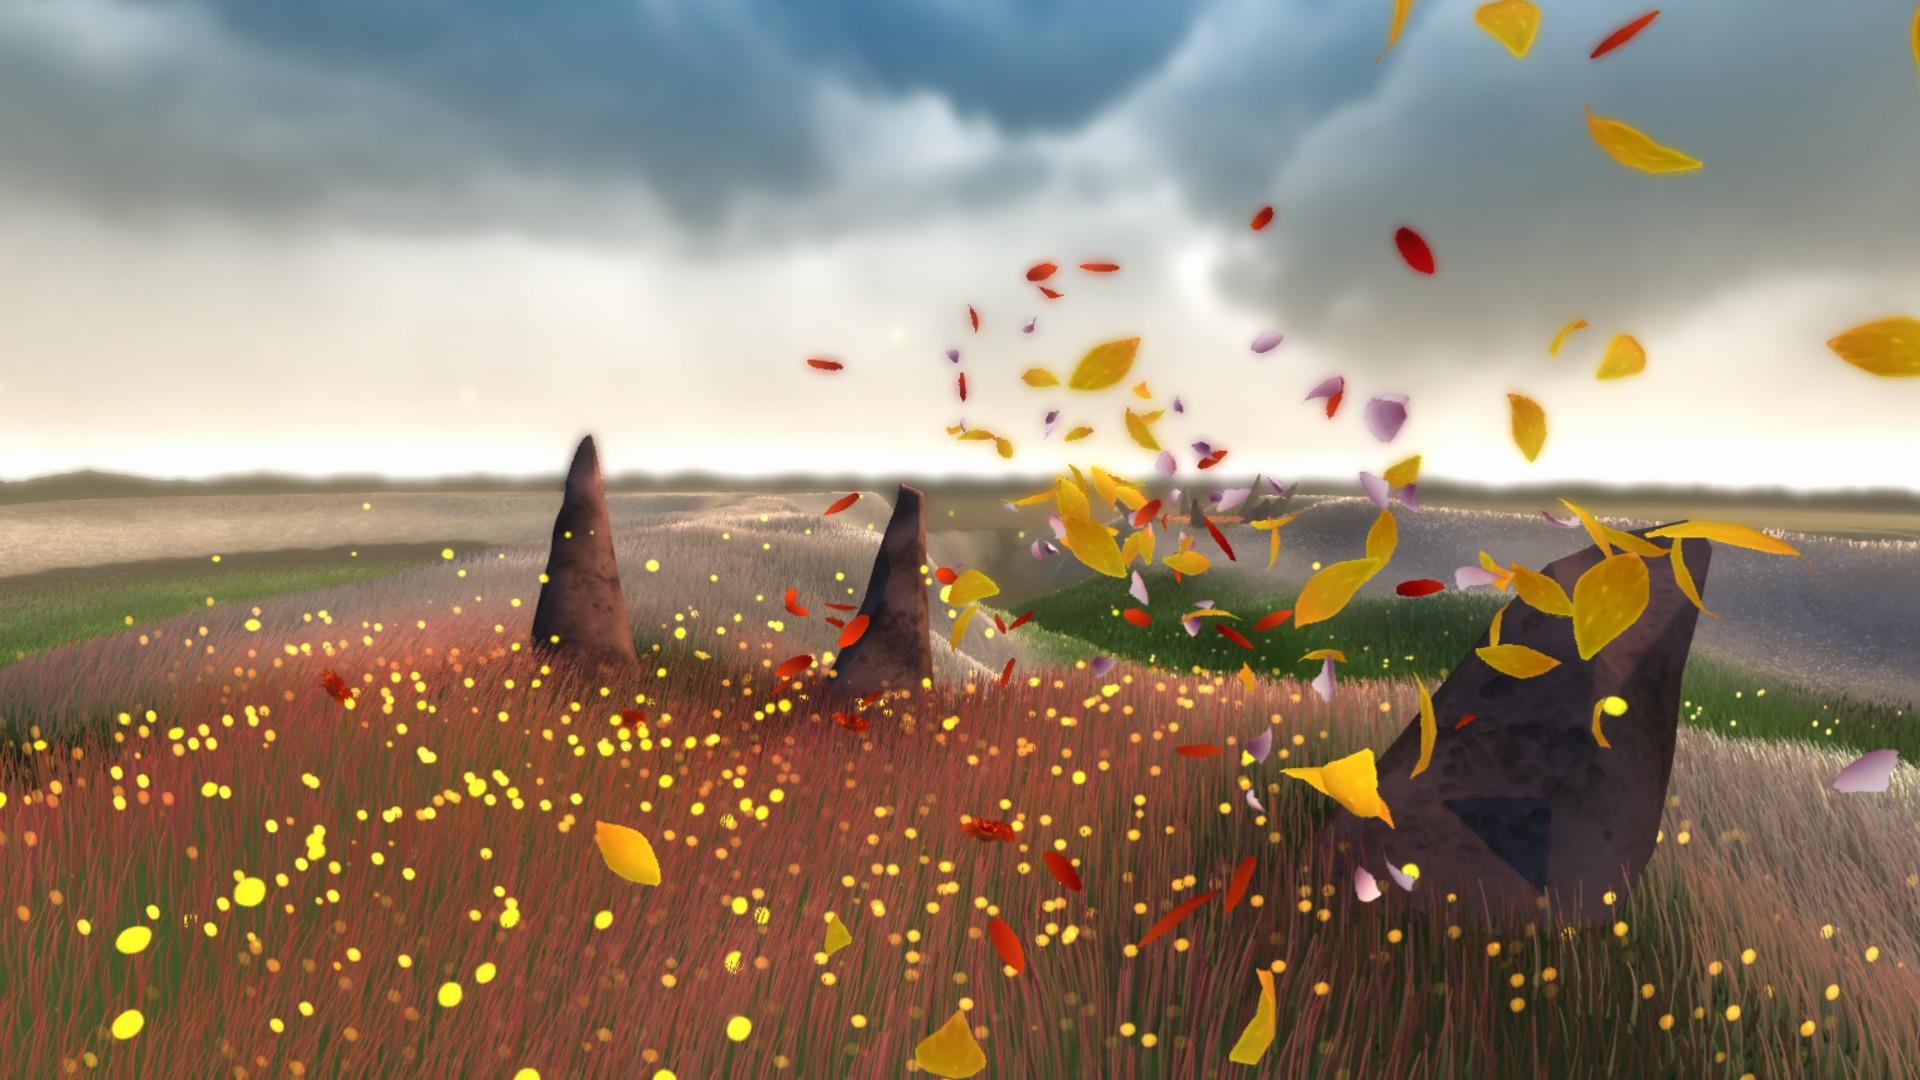 Digital Gems Flower Journey and Owlboy USgamer 1920x1080